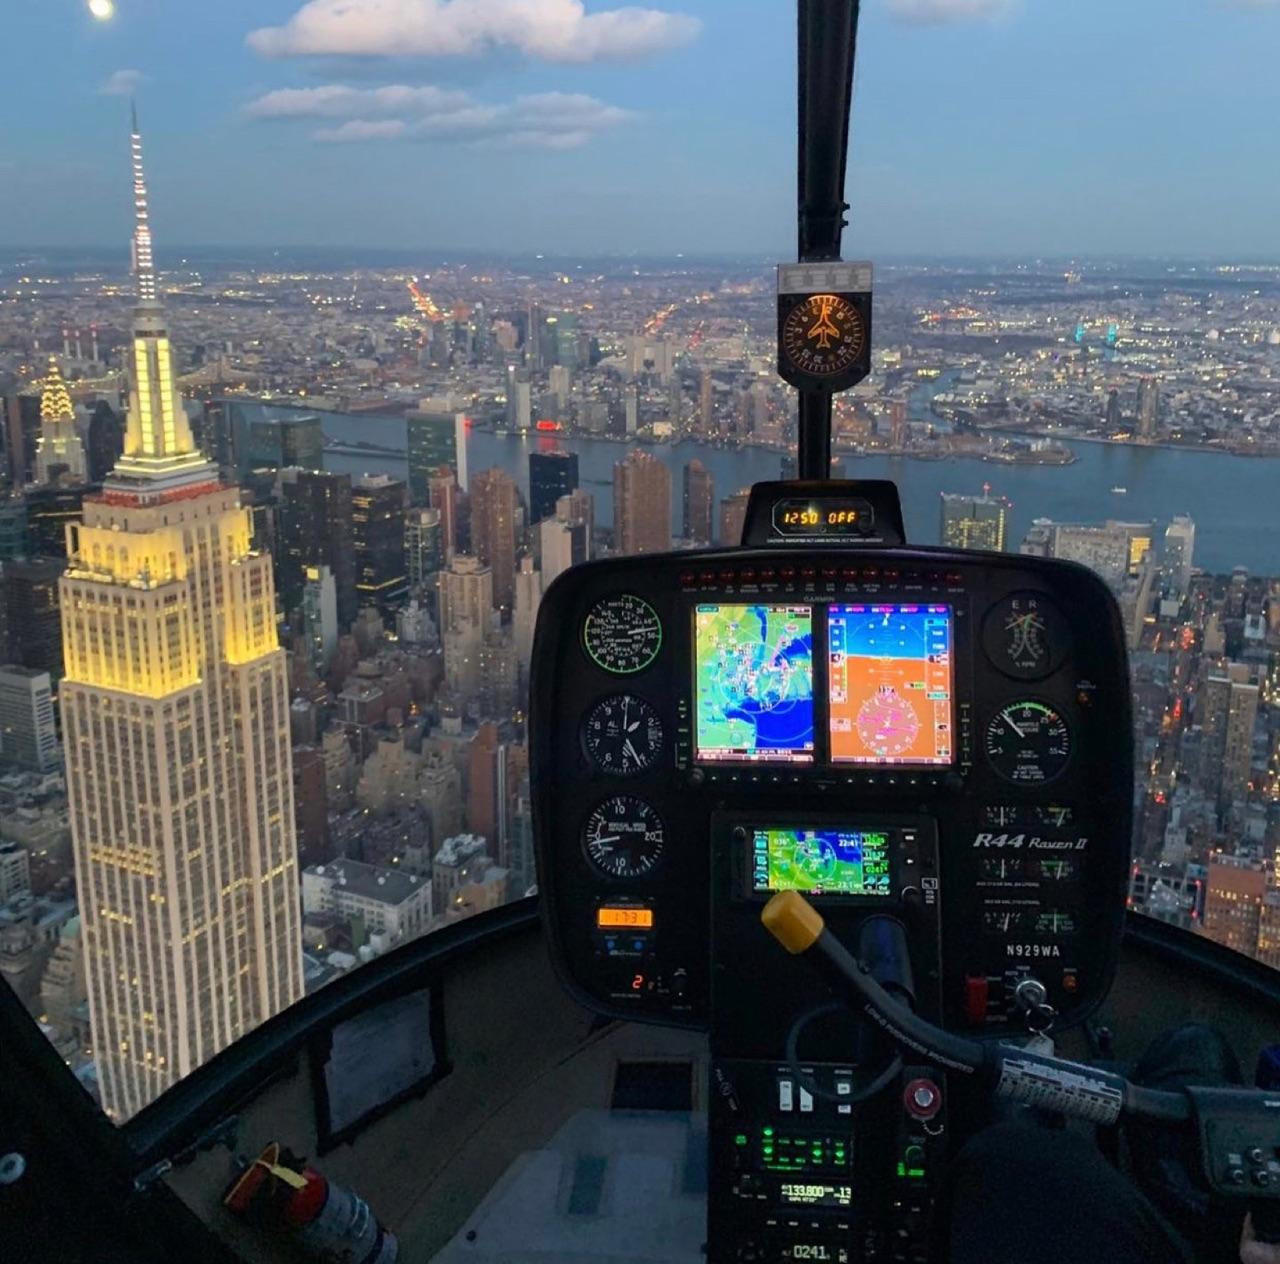 newyork and travel image